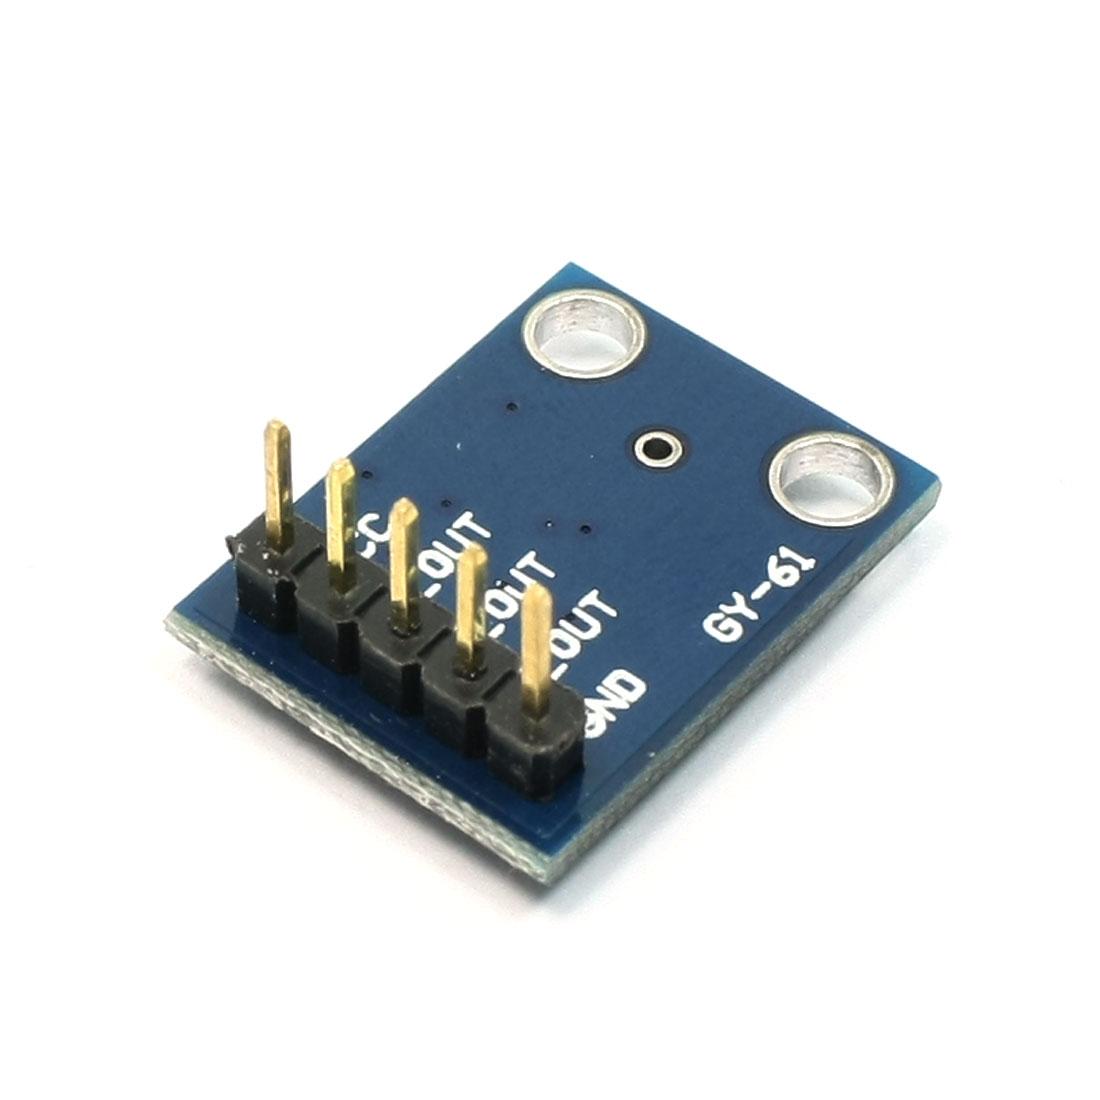 3-axis ADXL335 Analog Output Accelerometer Module Angular Transducer 3-5V